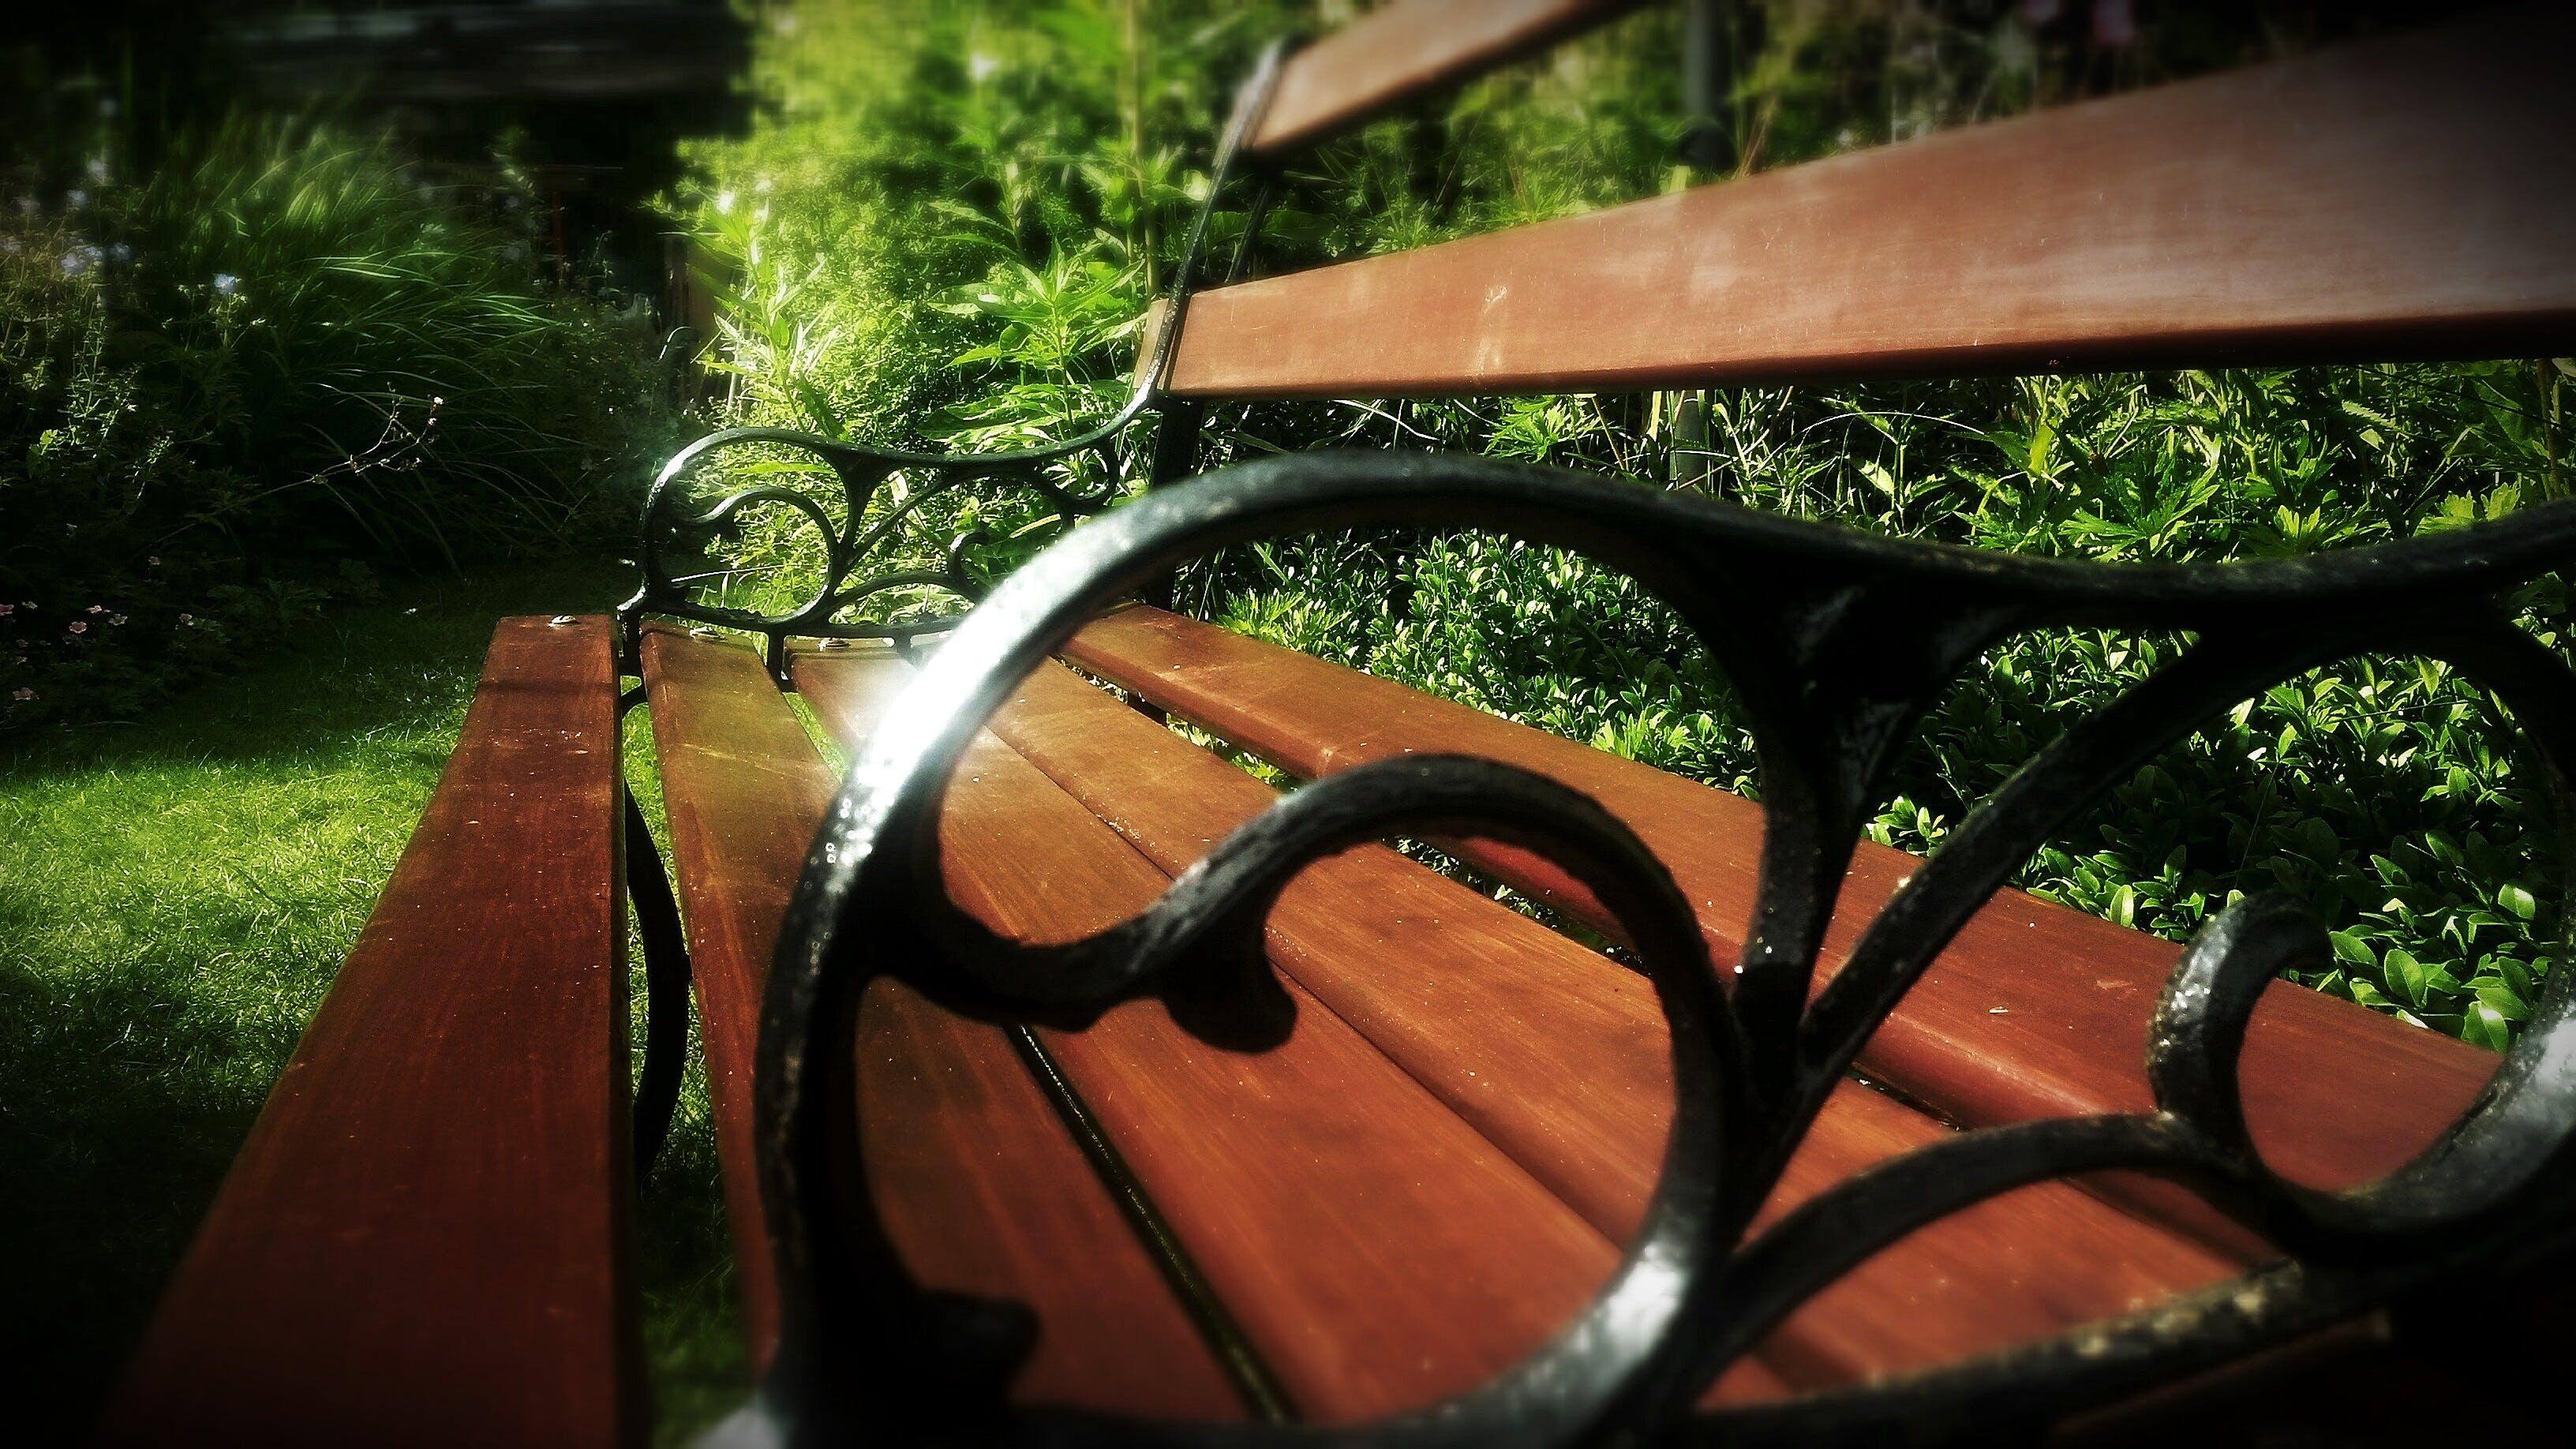 Free stock photo of bench, garden, seat, park bench